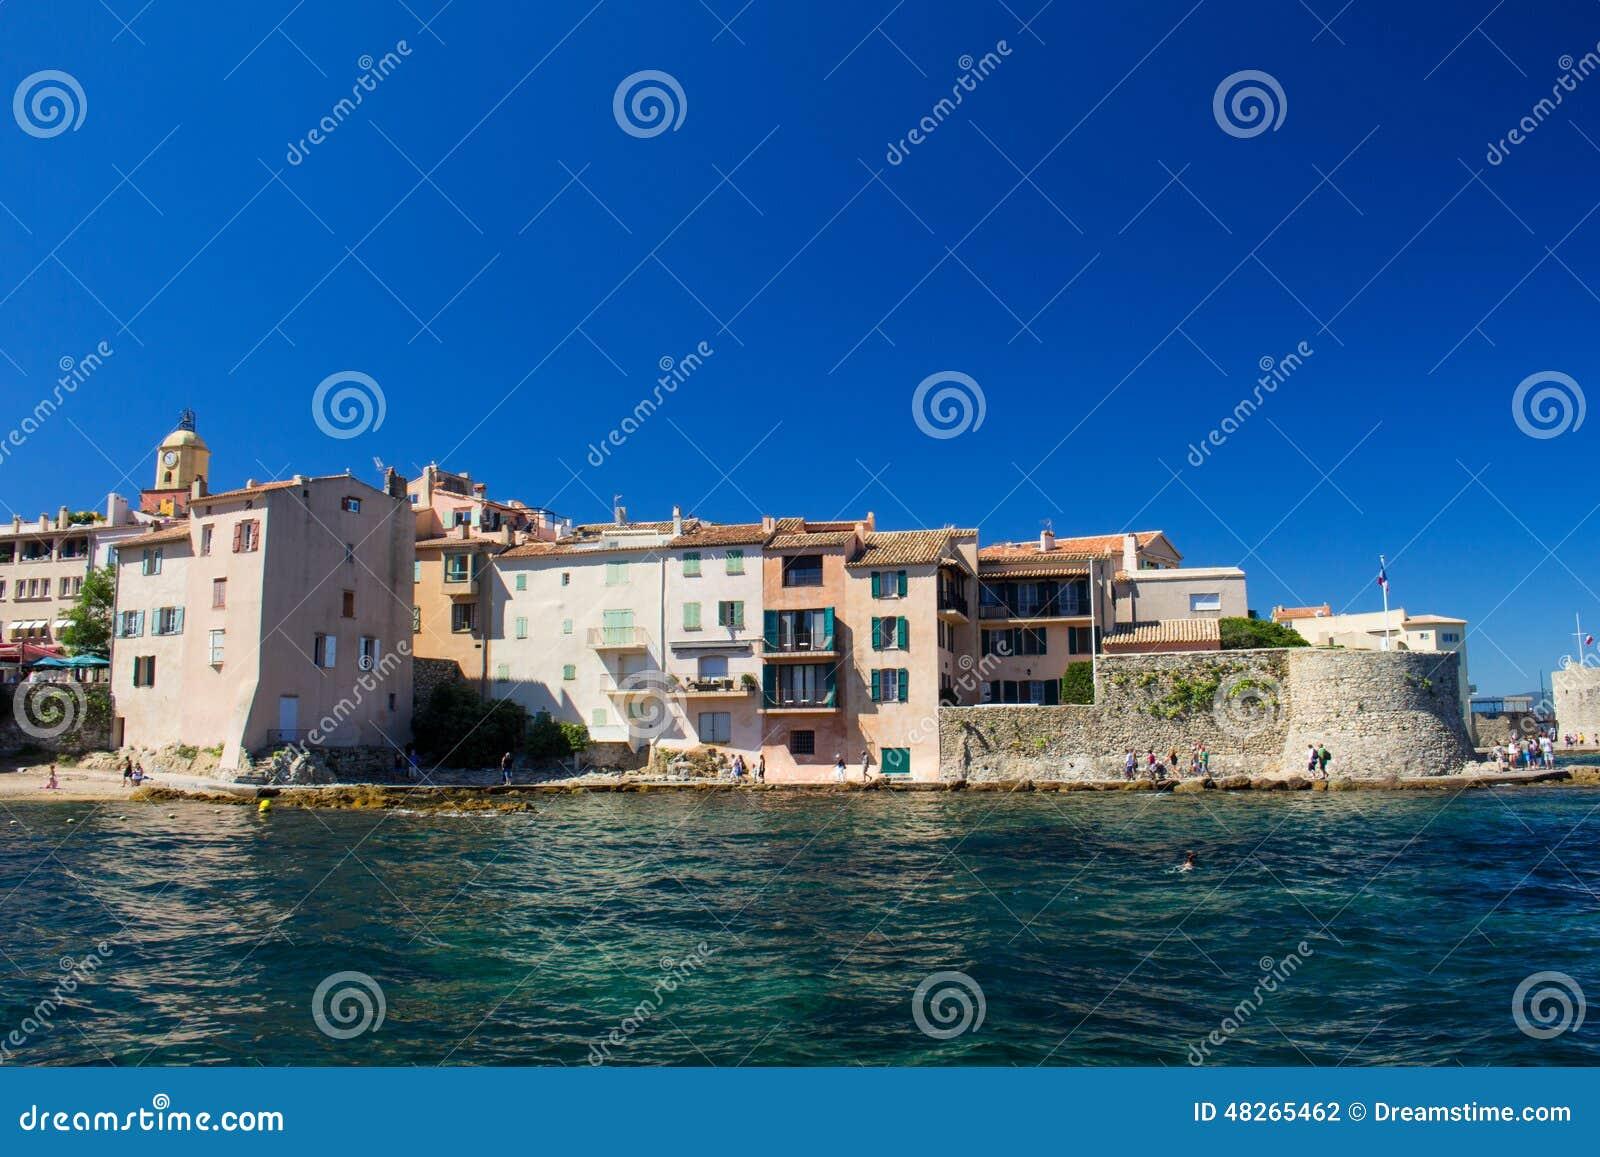 Старый город St Tropez